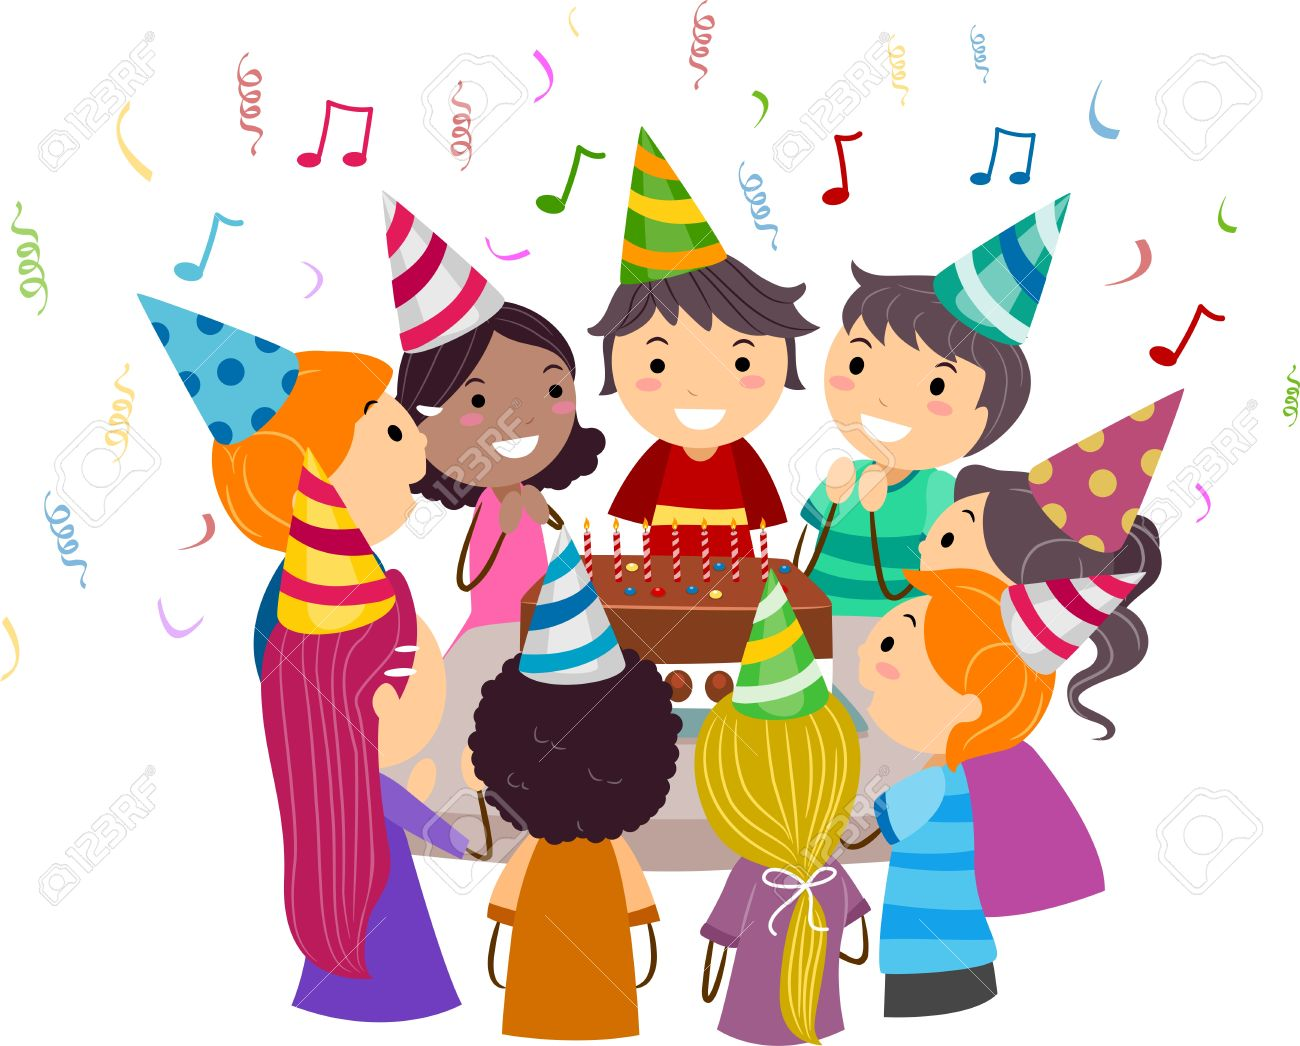 Illustration of Kids Gathered Around a Birthday Cake Stock Photo - 9707269